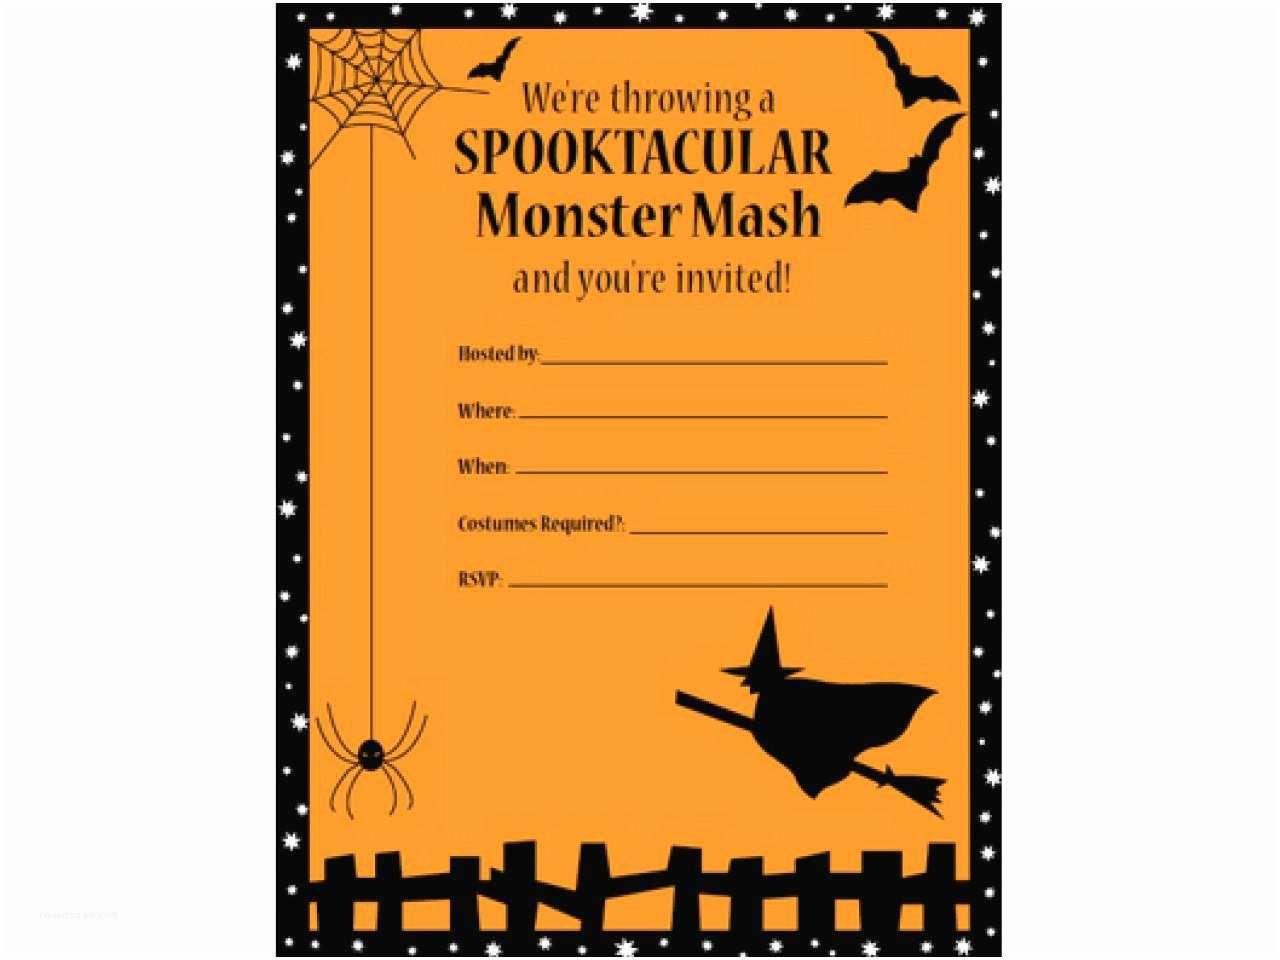 008 Breathtaking Halloween Party Invite Template Example  Templates - Free Printable Spooky Invitation BirthdayFull